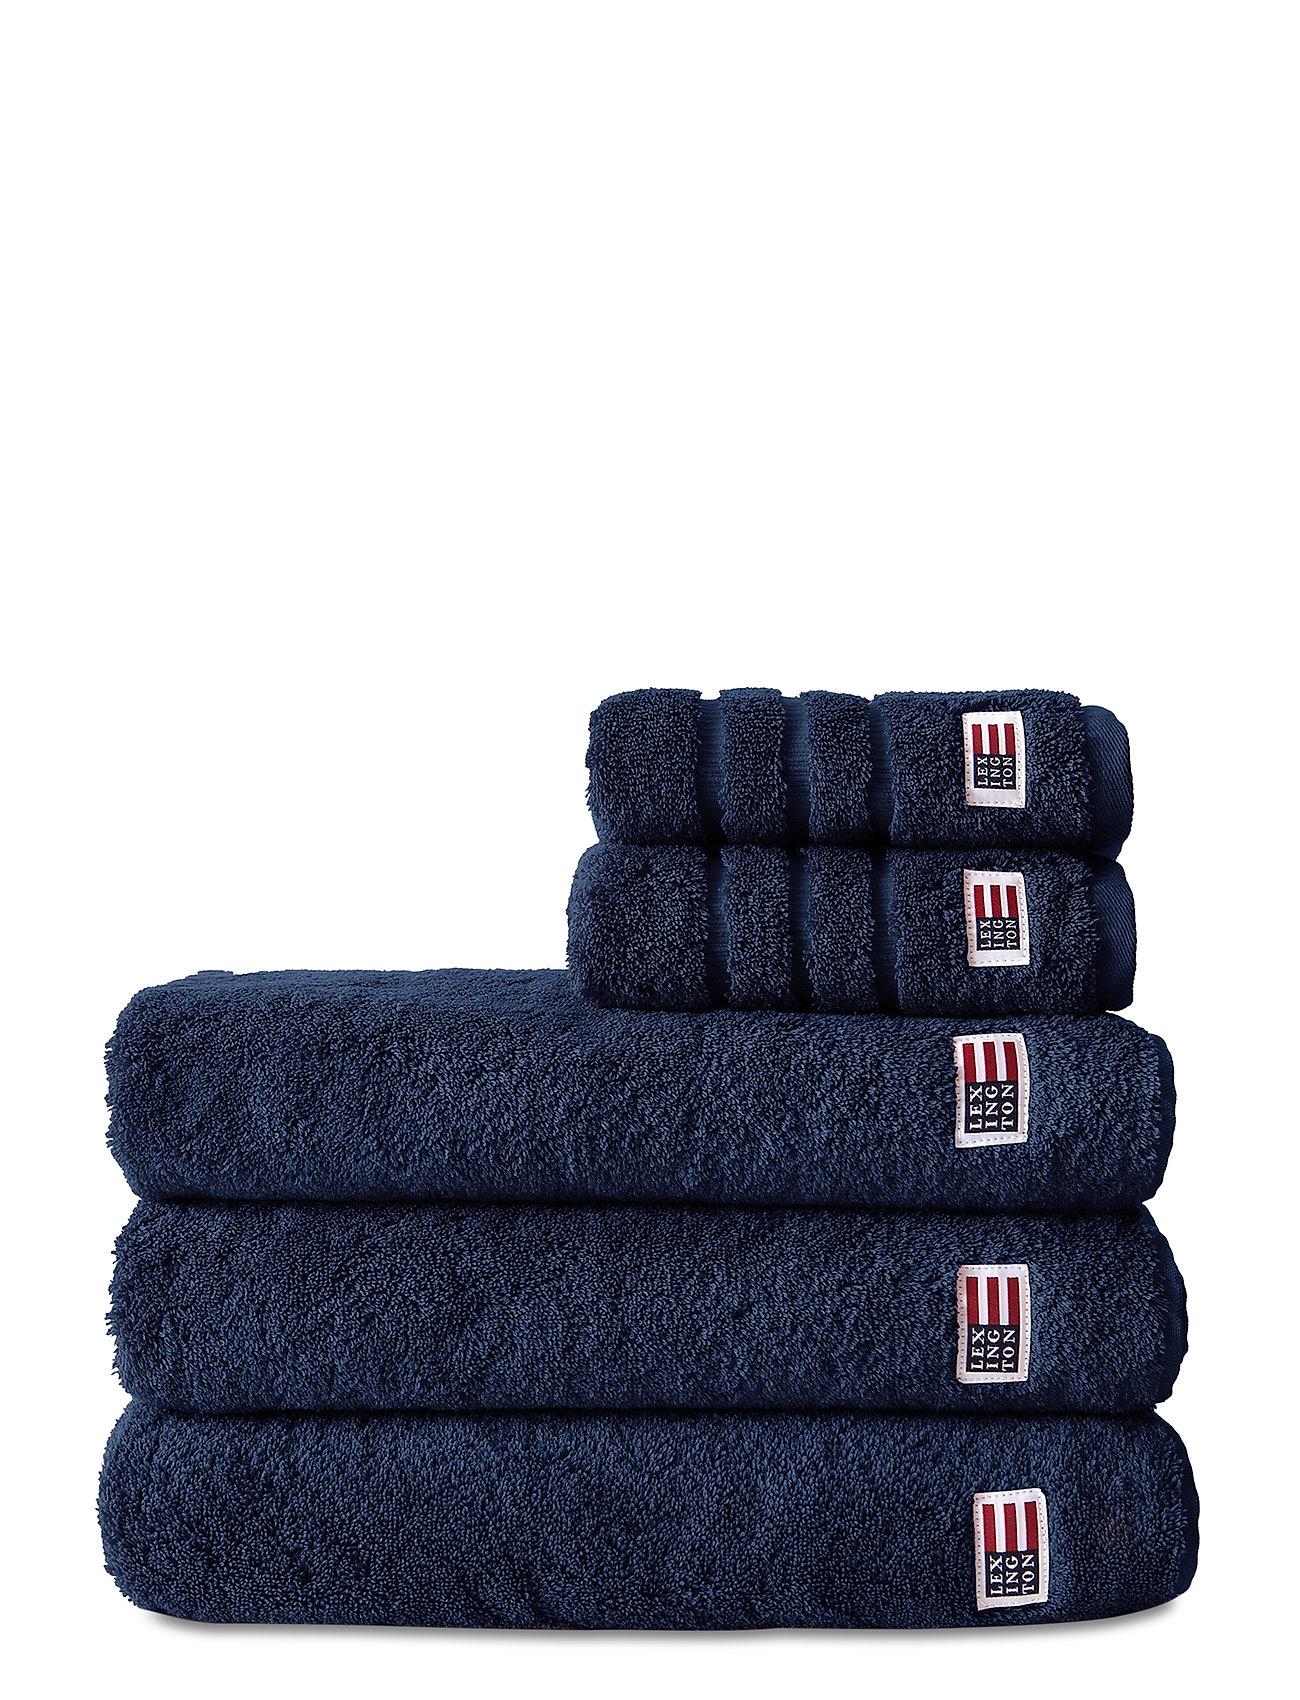 Lexington Home Original Towel Navy - NAVY